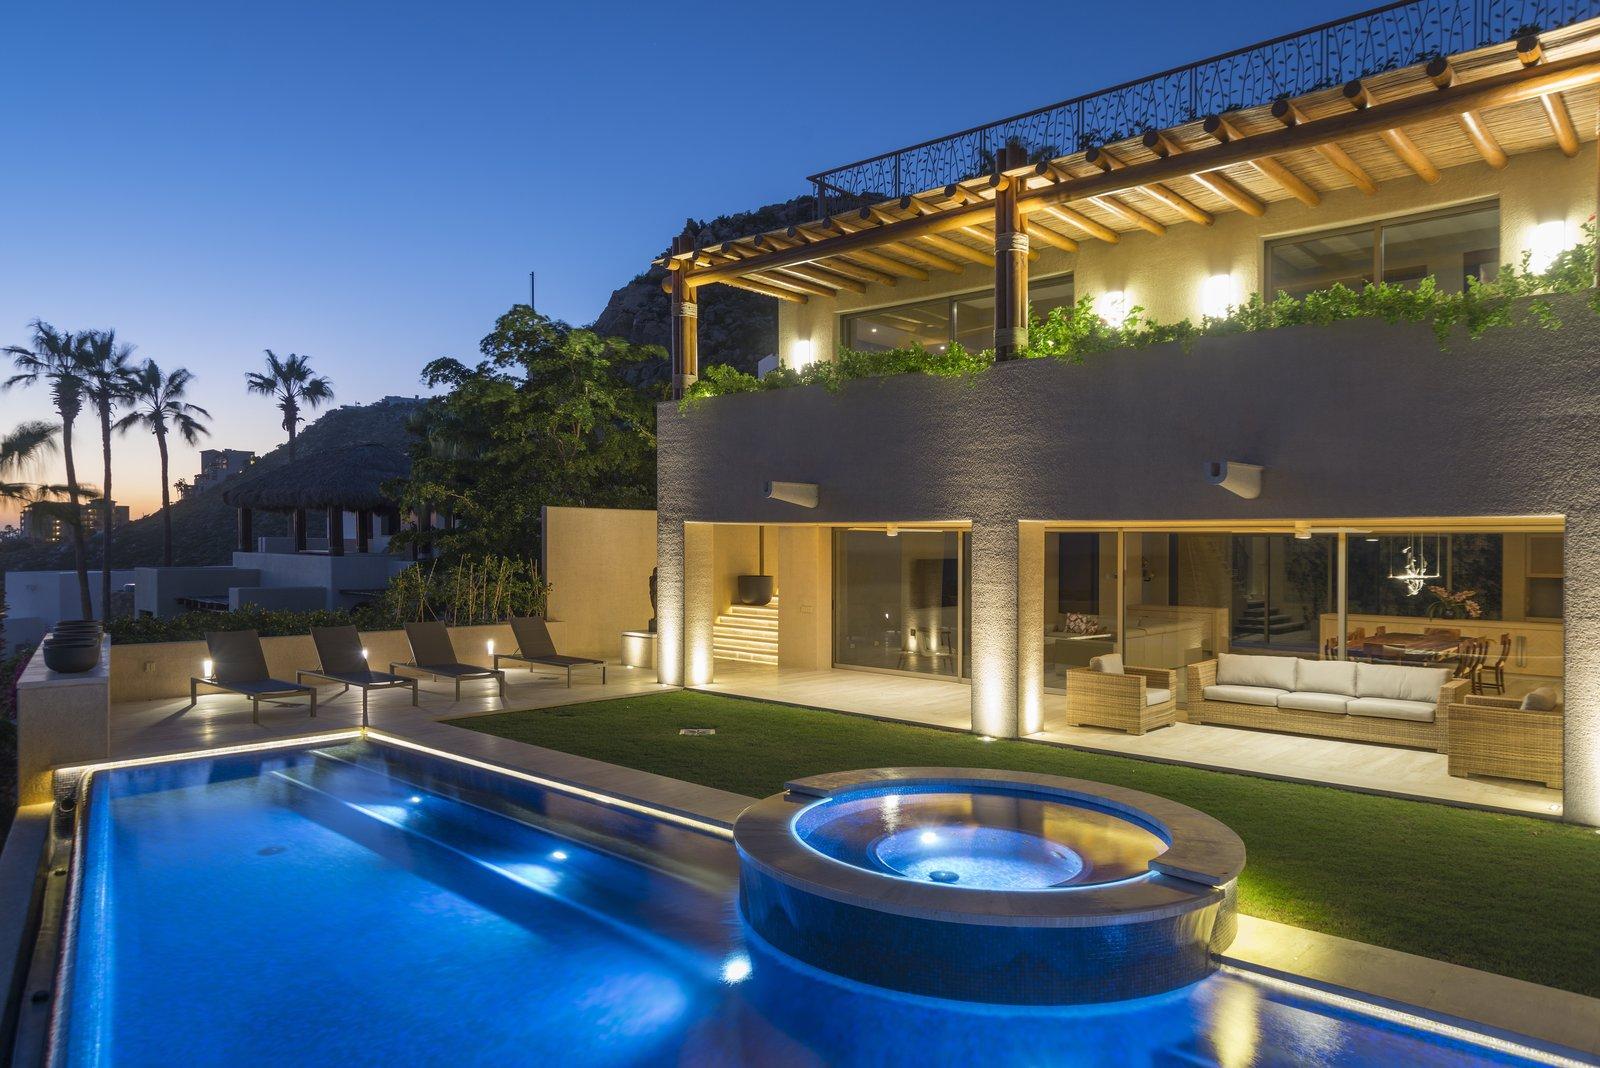 Modern Mexican Retreat Casa Grillo Stuns From An Ocean